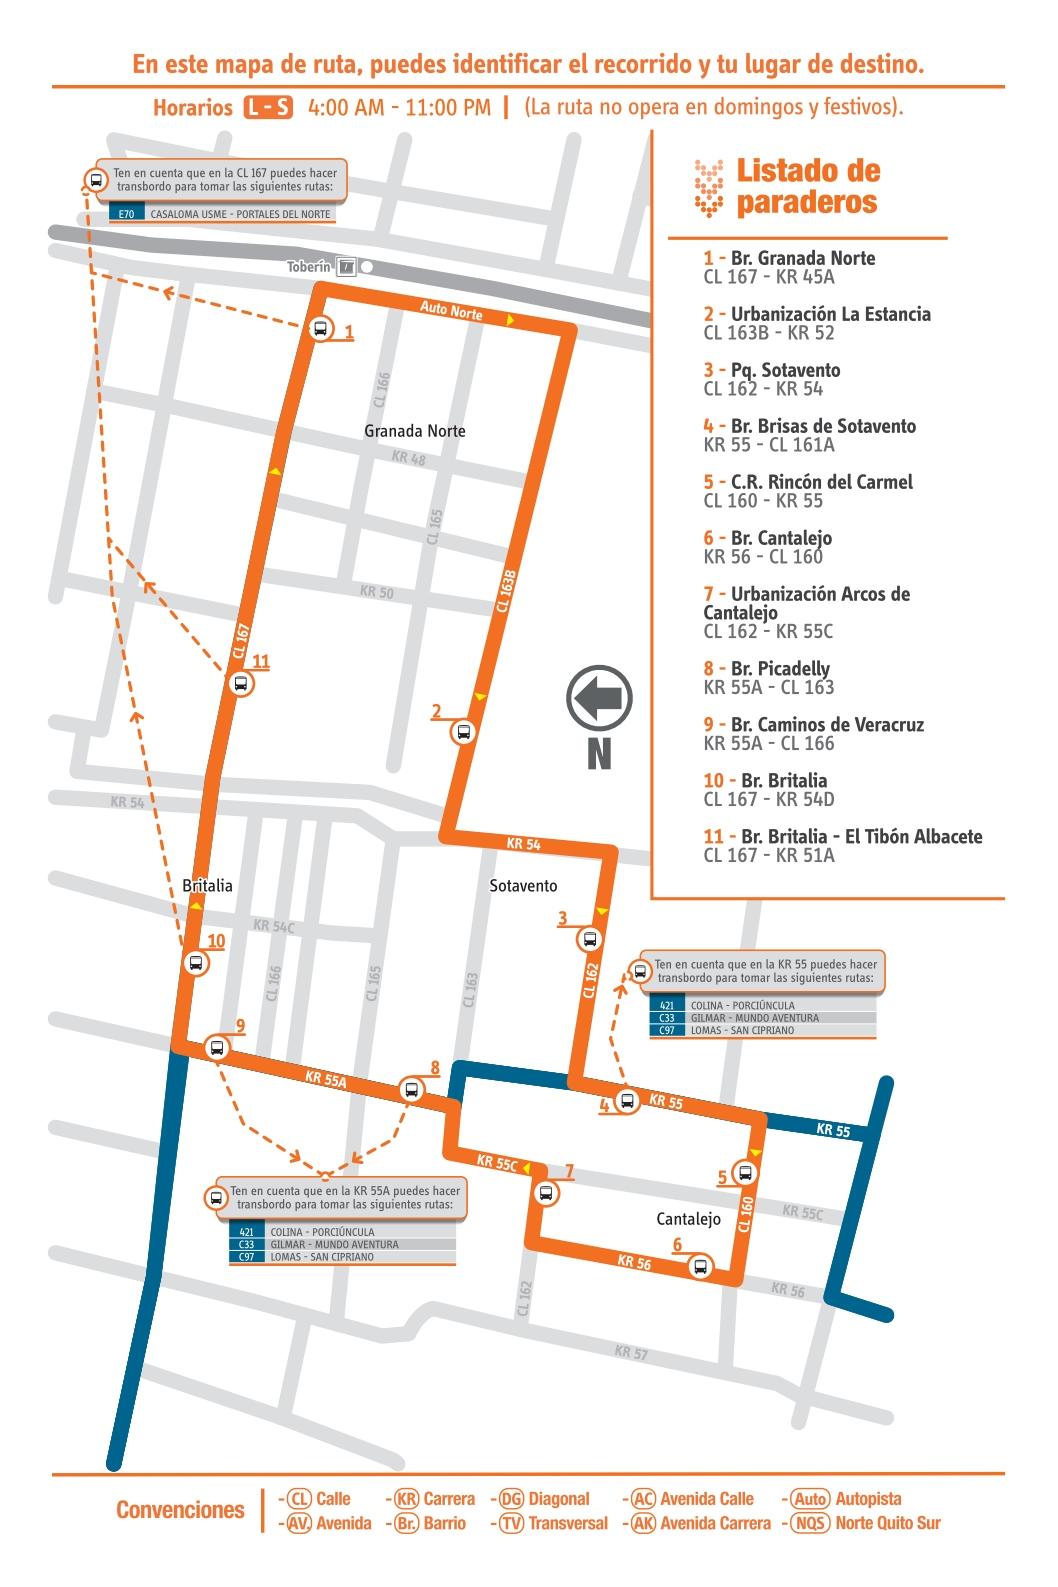 Ruta SITP: 19-12 Cantalejo [Complementaria]